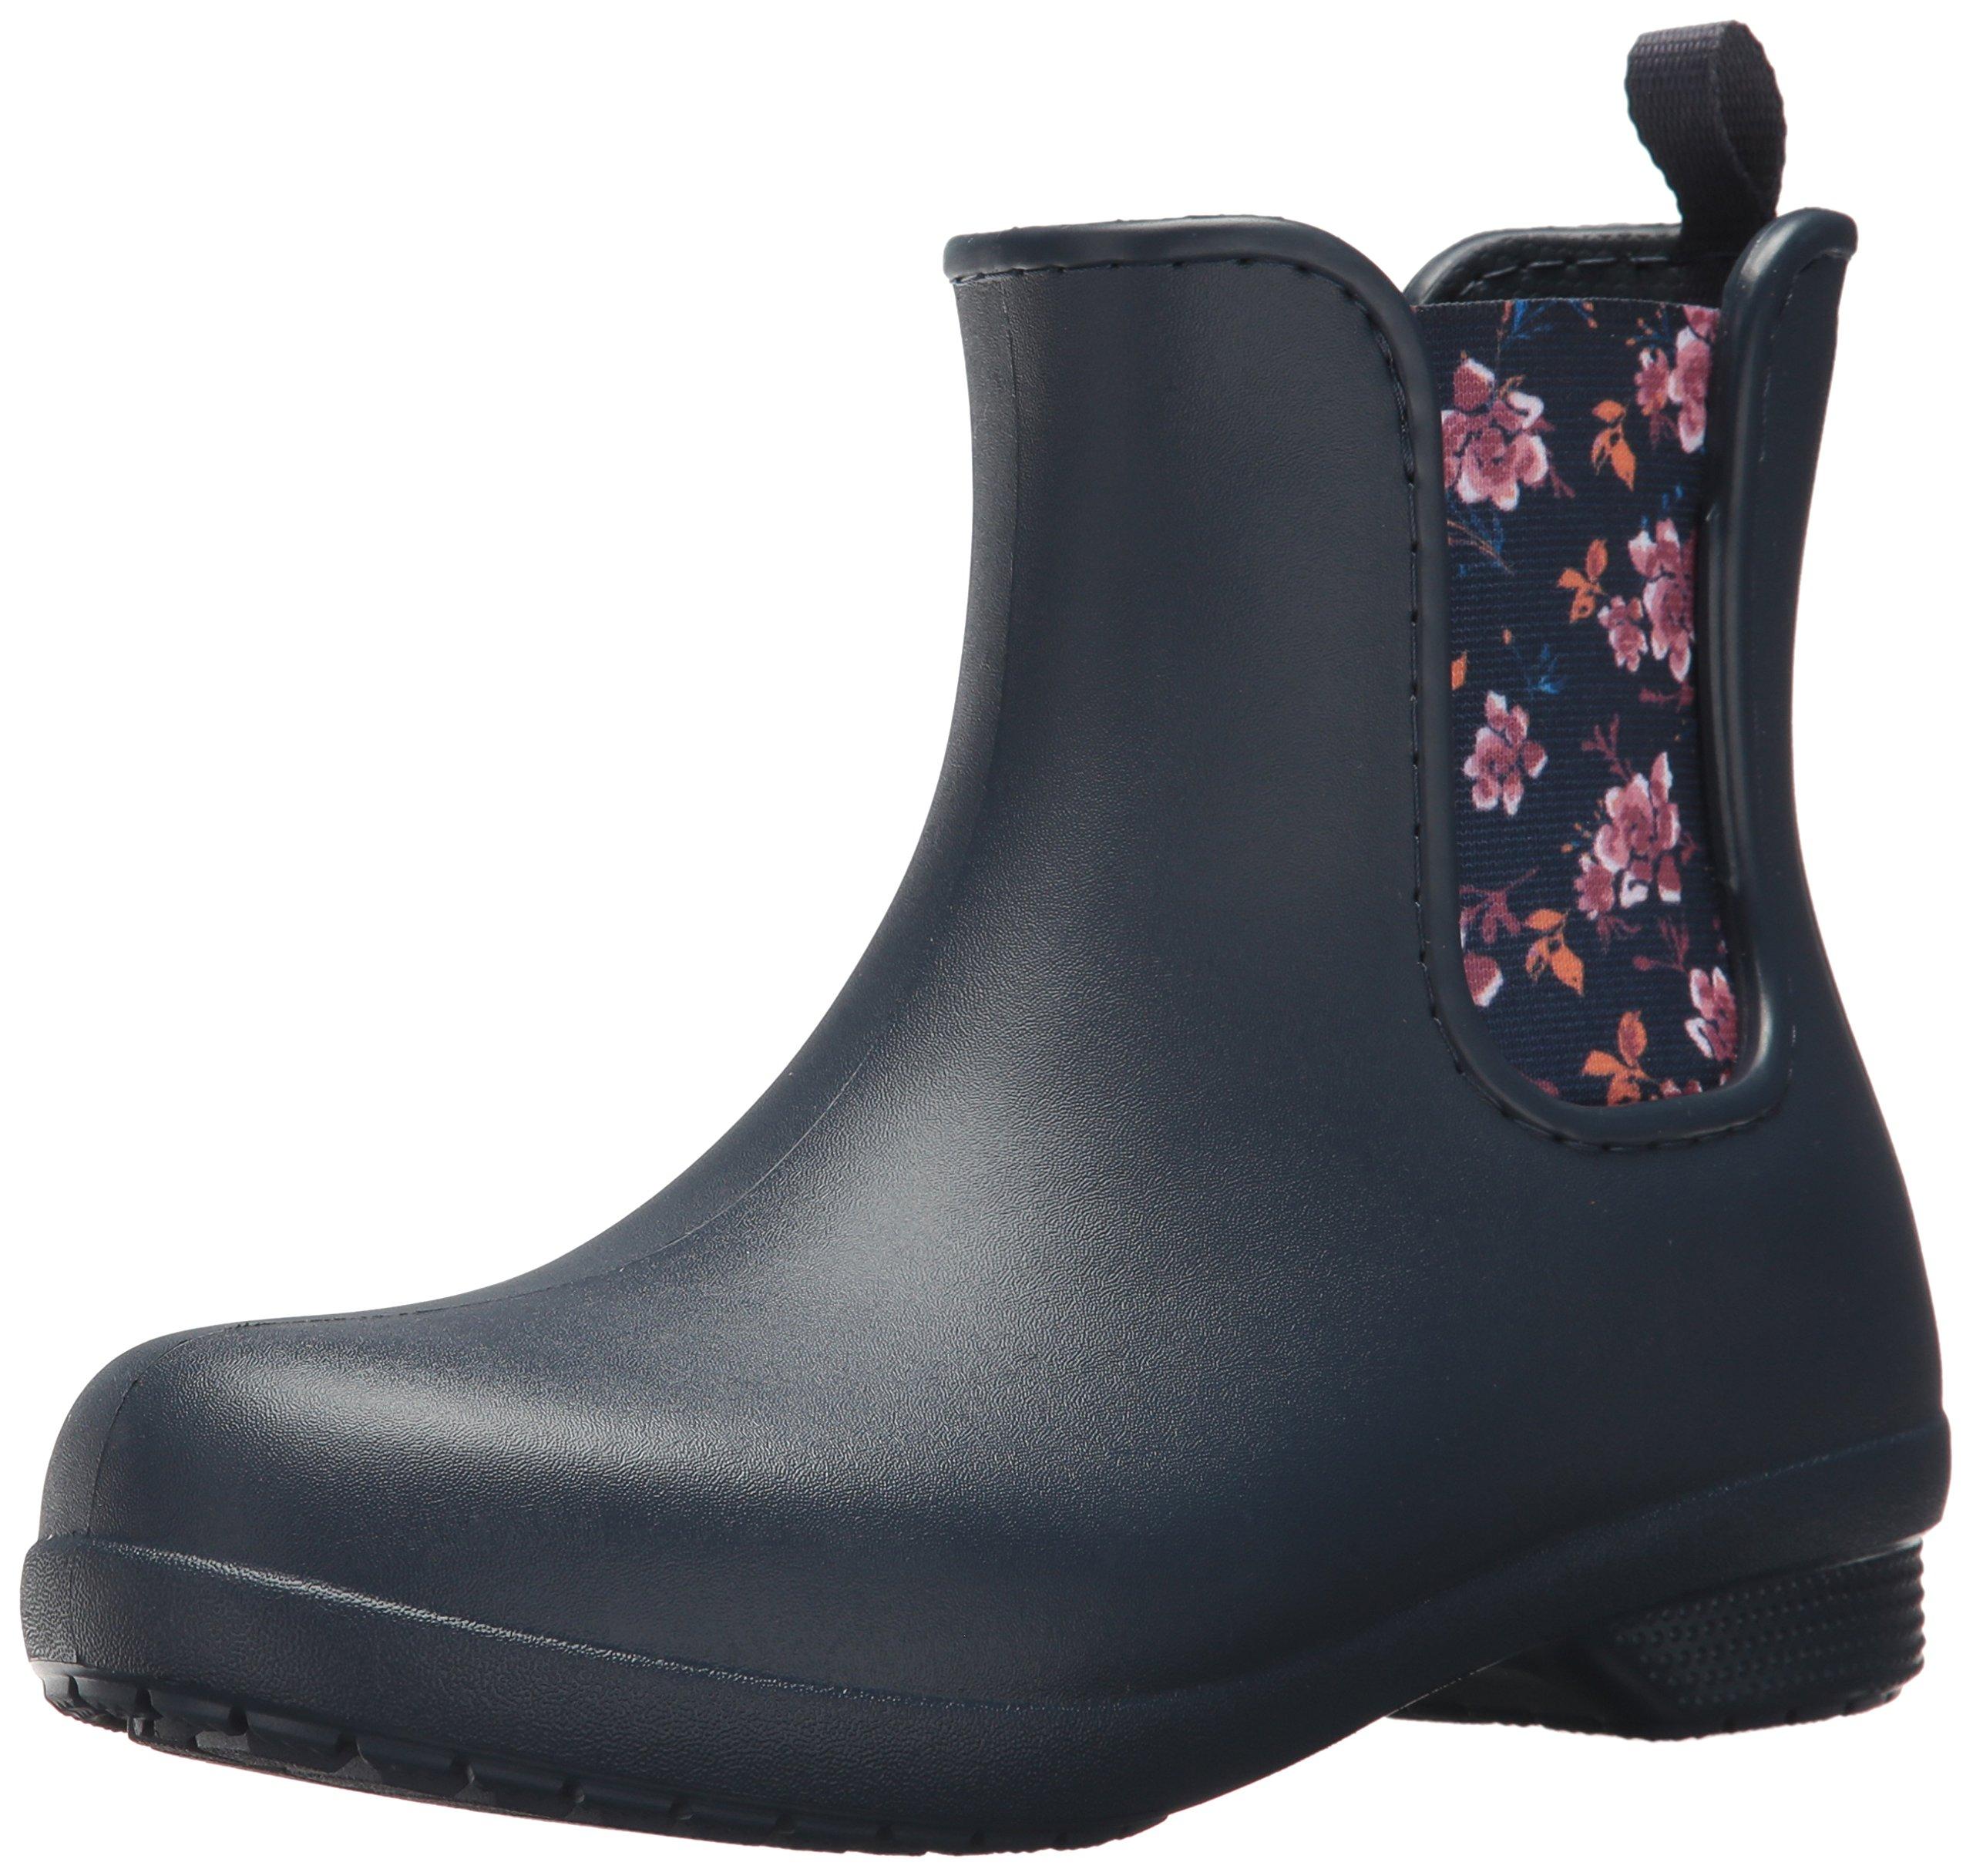 Crocs Women's Freesail Chelsea W Rain Boot, Navy/Floral, 9 M US